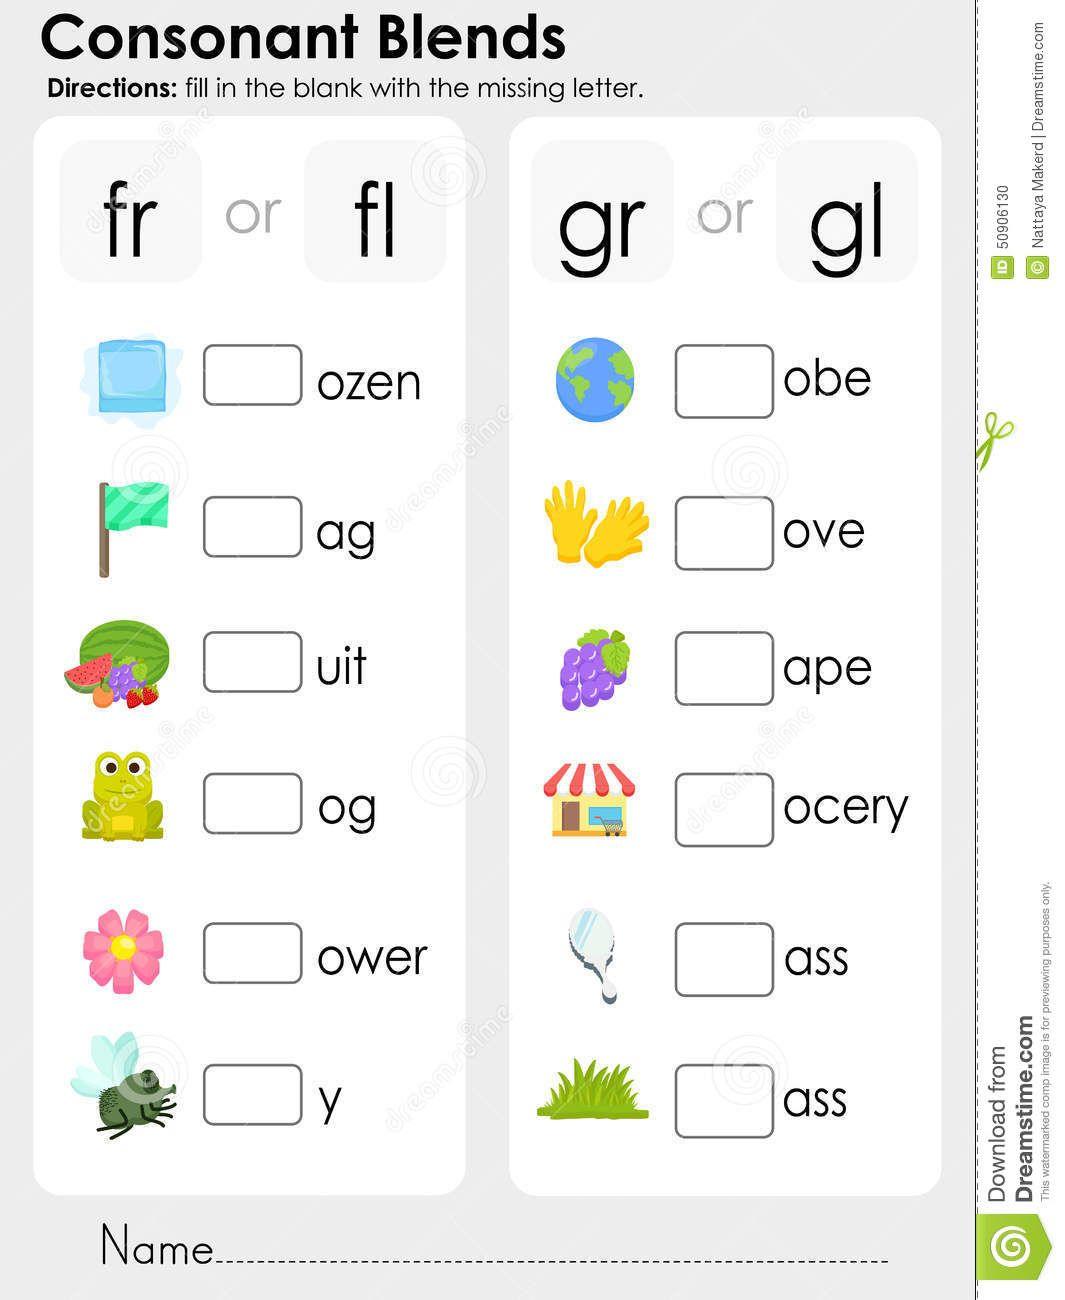 Consonant Blends Worksheets Pdf - Letter [ 1300 x 1065 Pixel ]